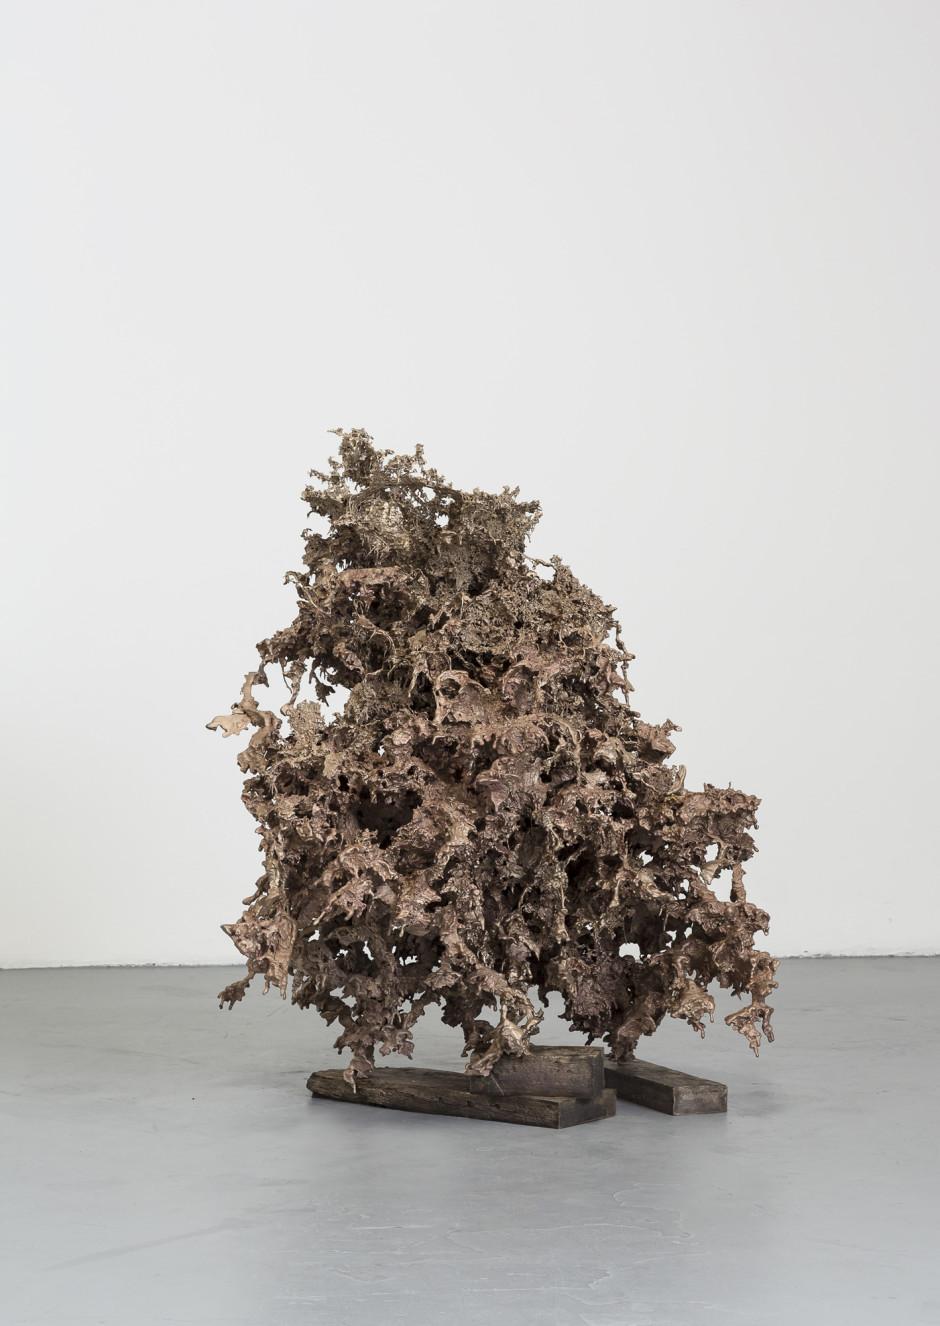 Water Cast 8, 2015  cast bronze  165.1 x 152.4 x 165.1 cm 65 x 60 x 65 in.